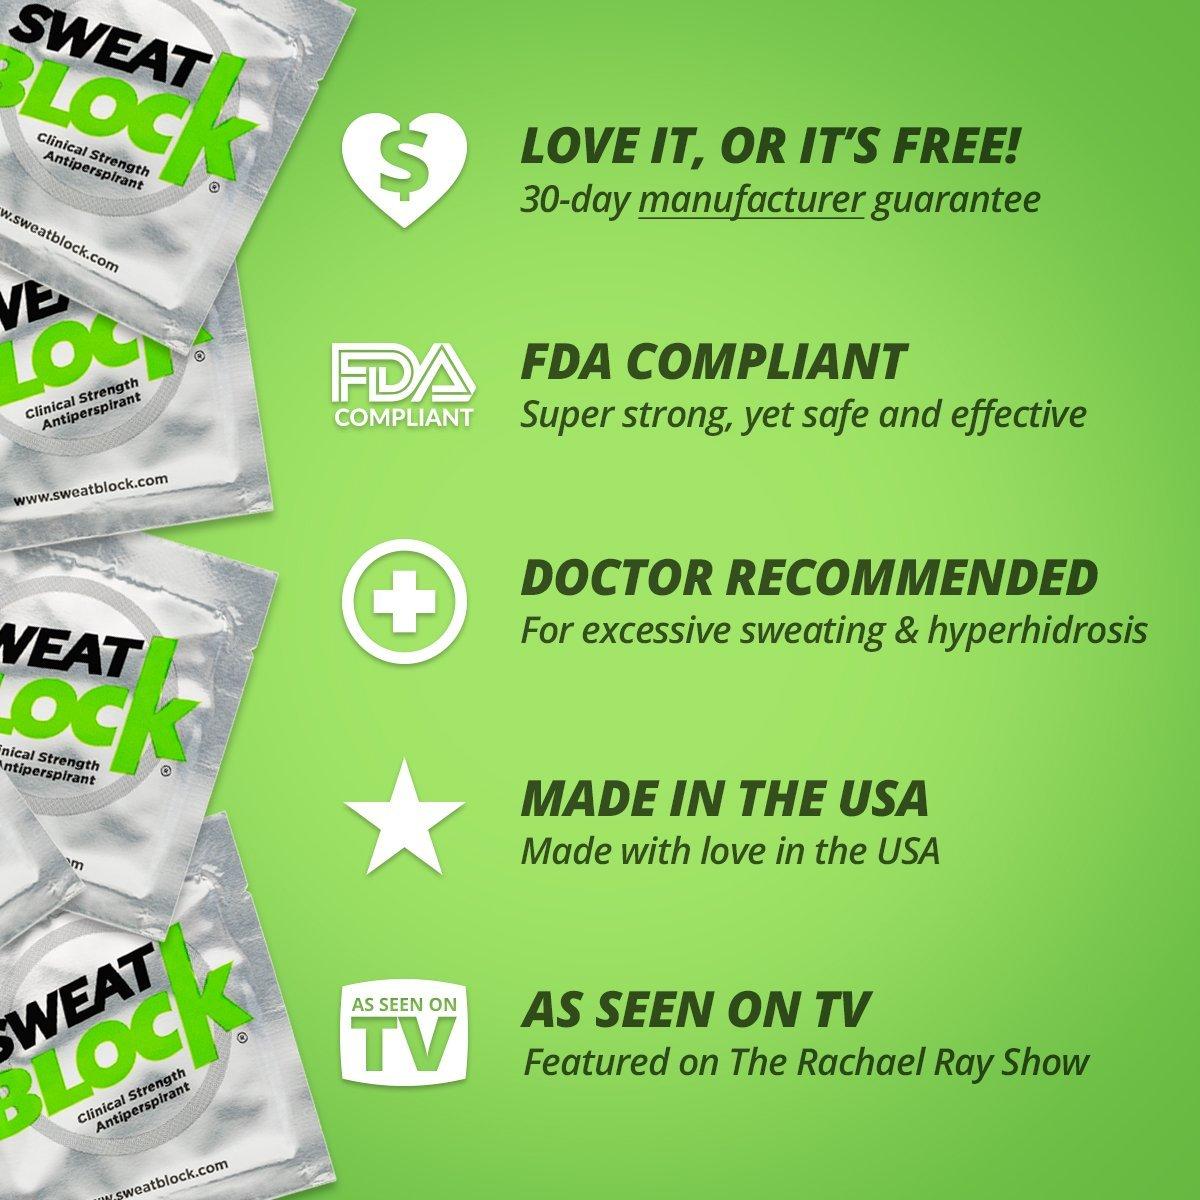 SweatBlock Antiperspirant - Clinical Strength - Reduce Sweat up to 7-days per Use by SweatBlock (Image #9)